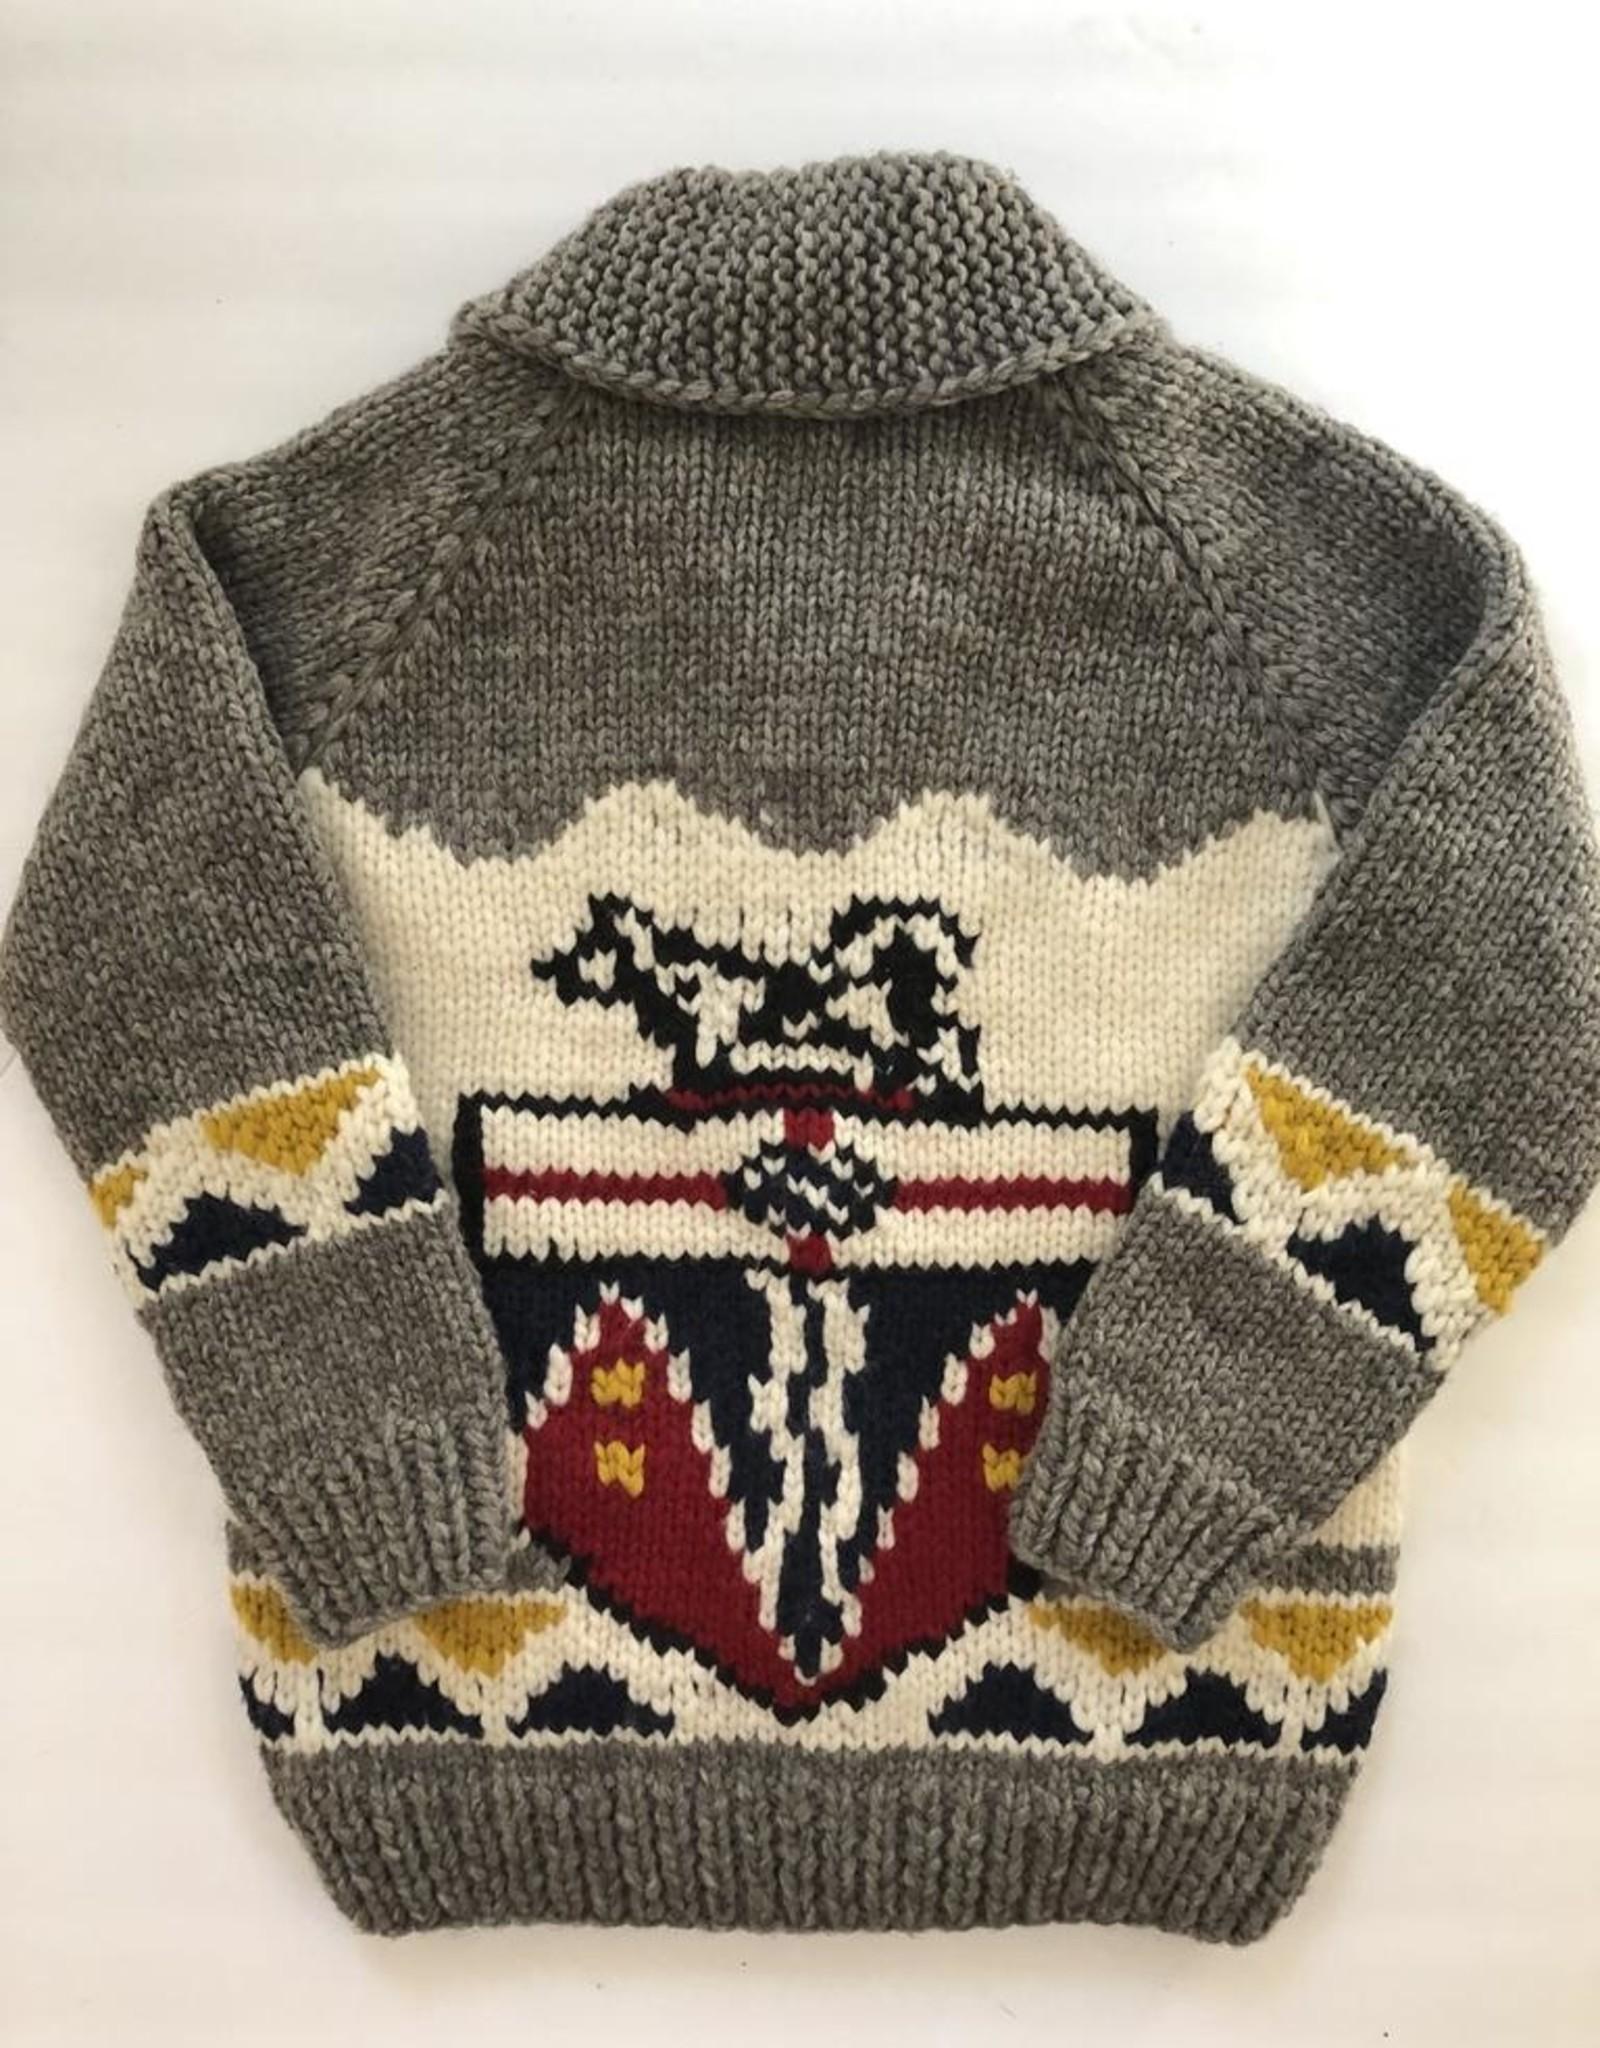 Handknit Yukon Coat of Arms Heritage Sweater